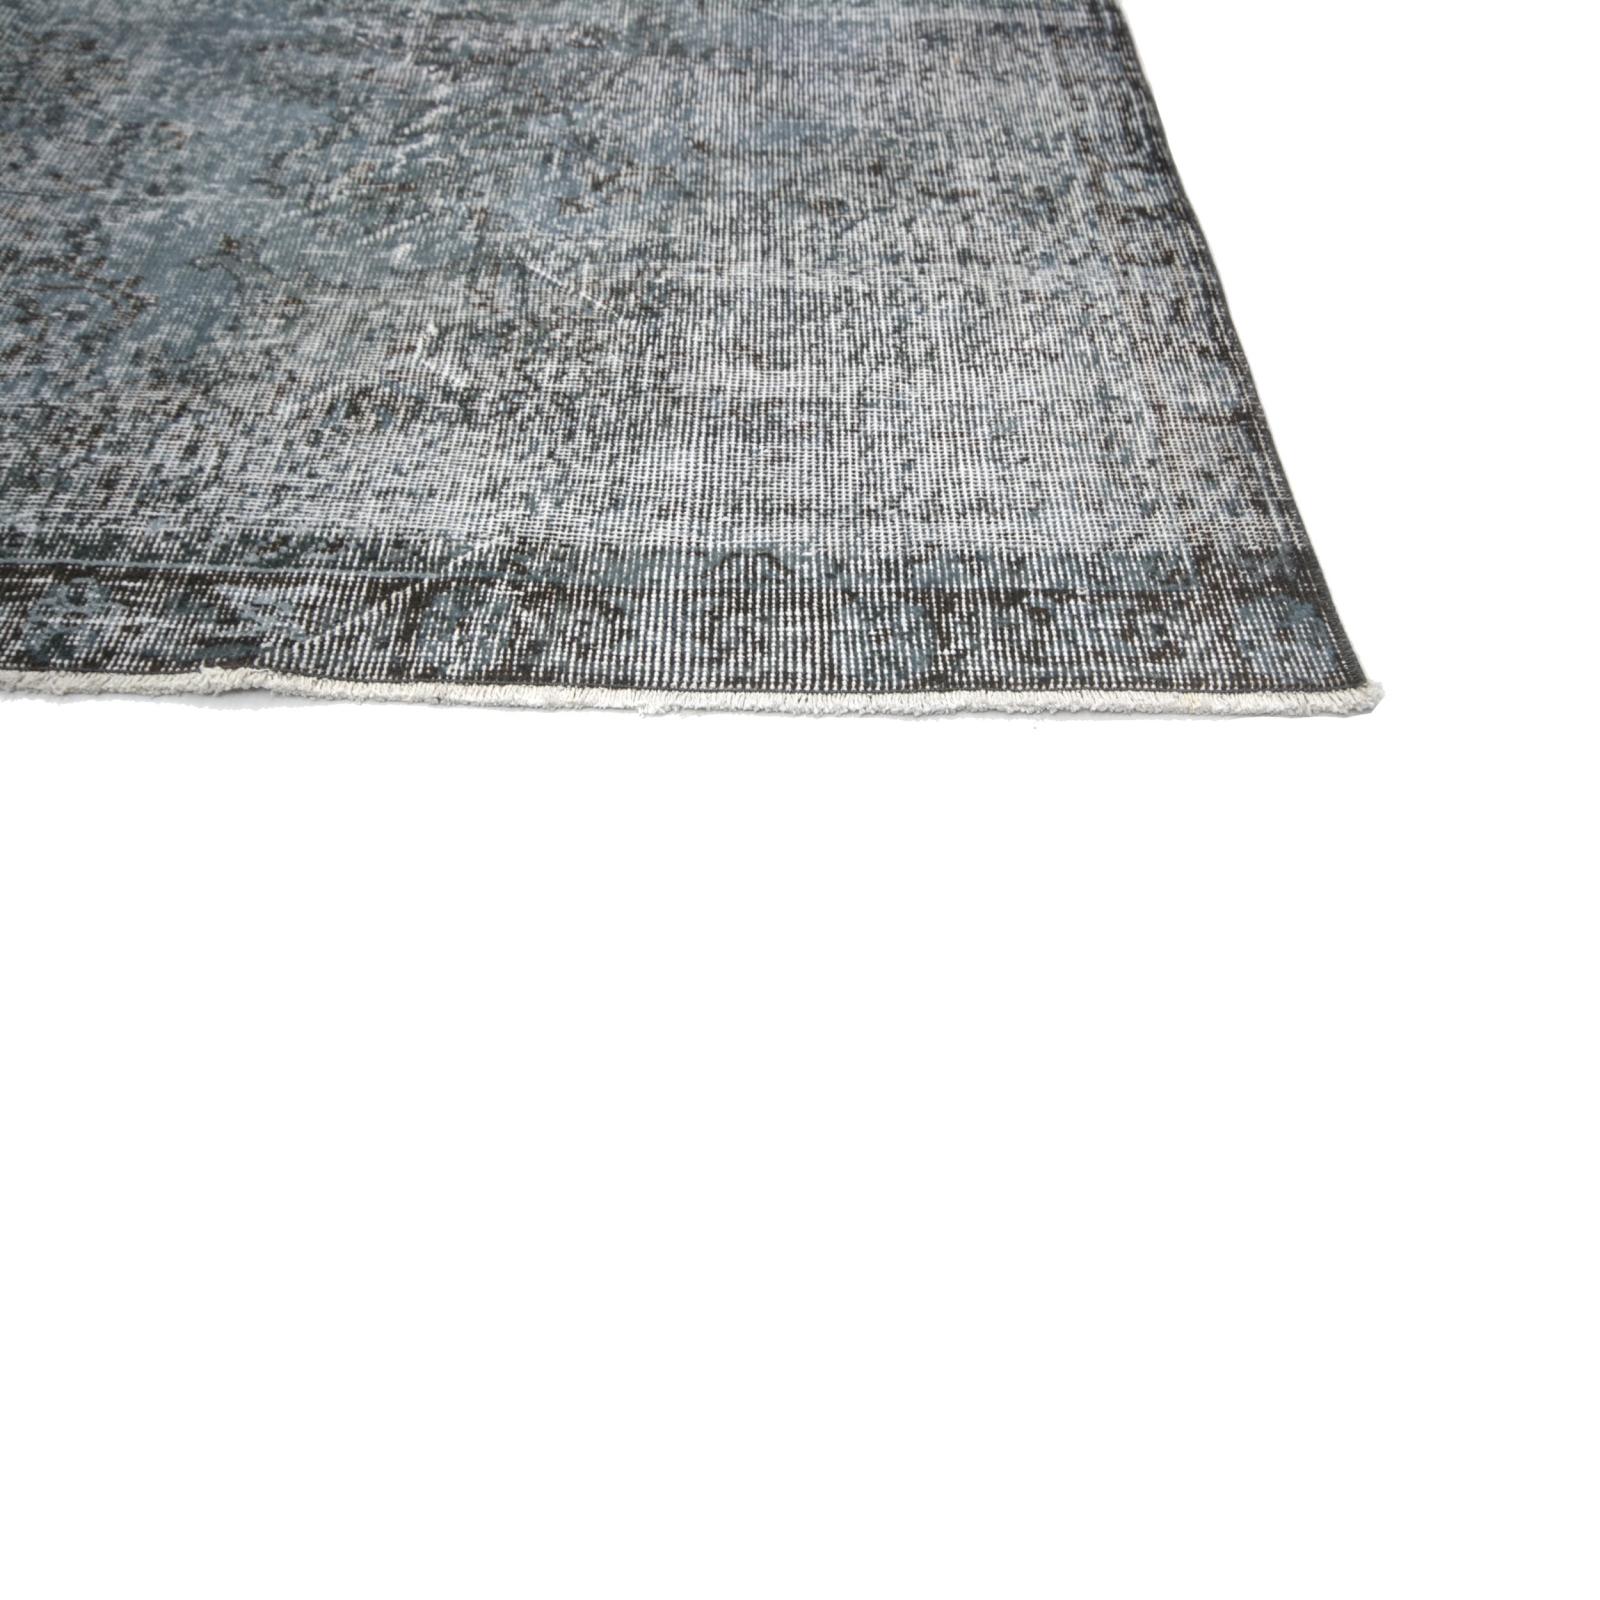 Grau vintage umgefärbt teppich (193x295cm)